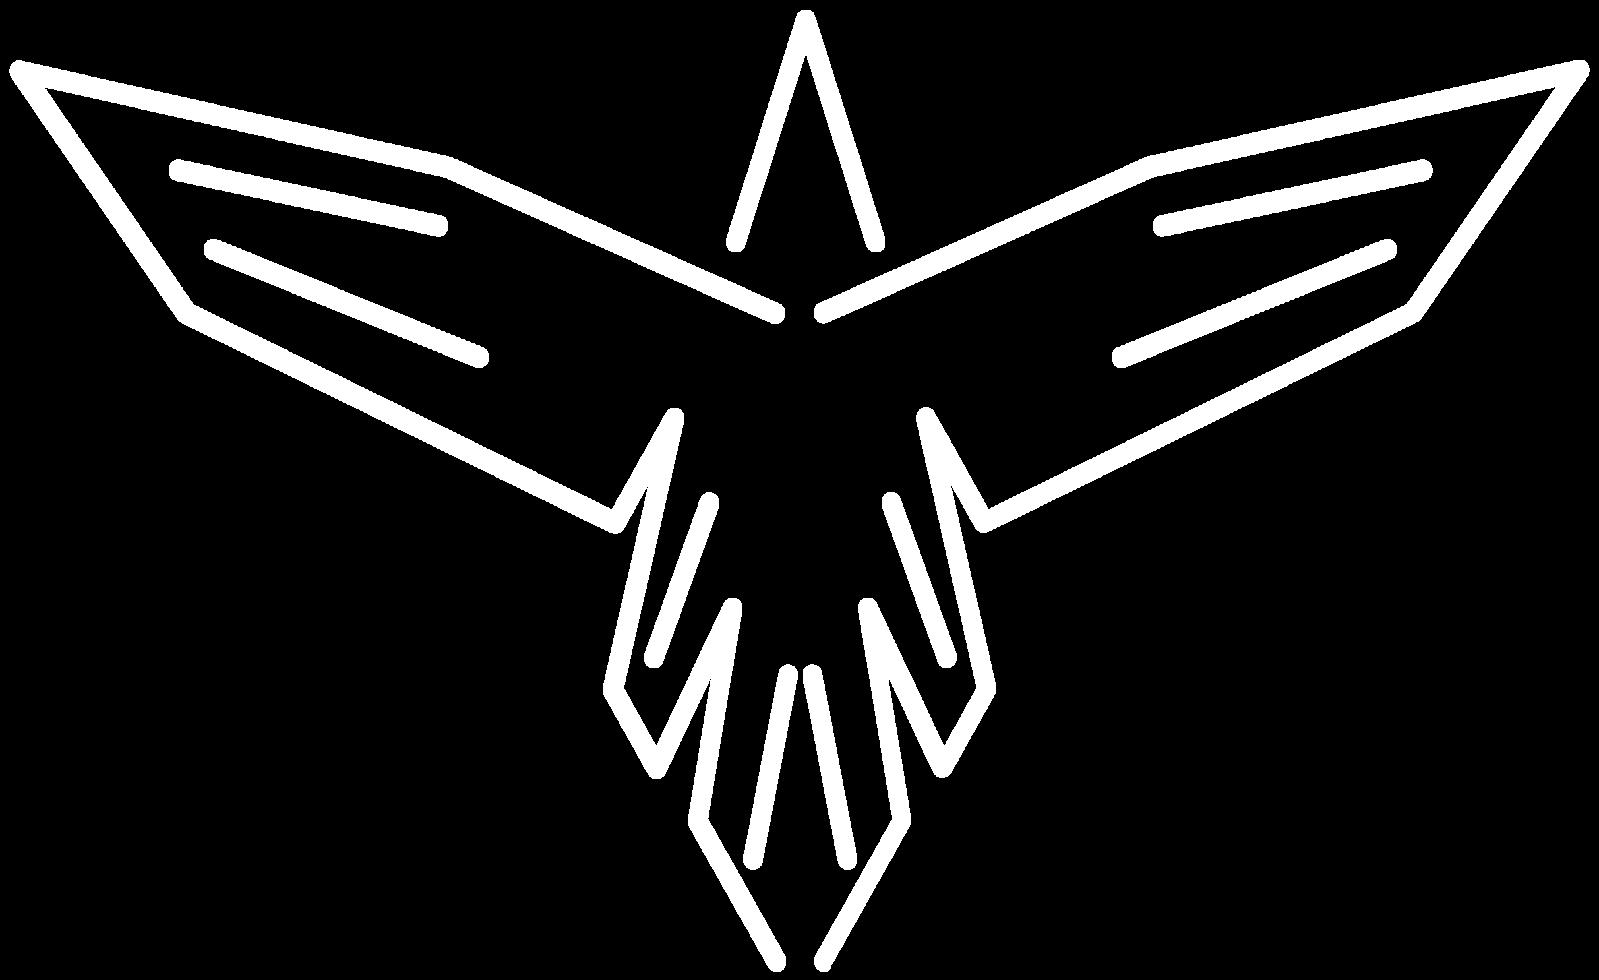 falco png